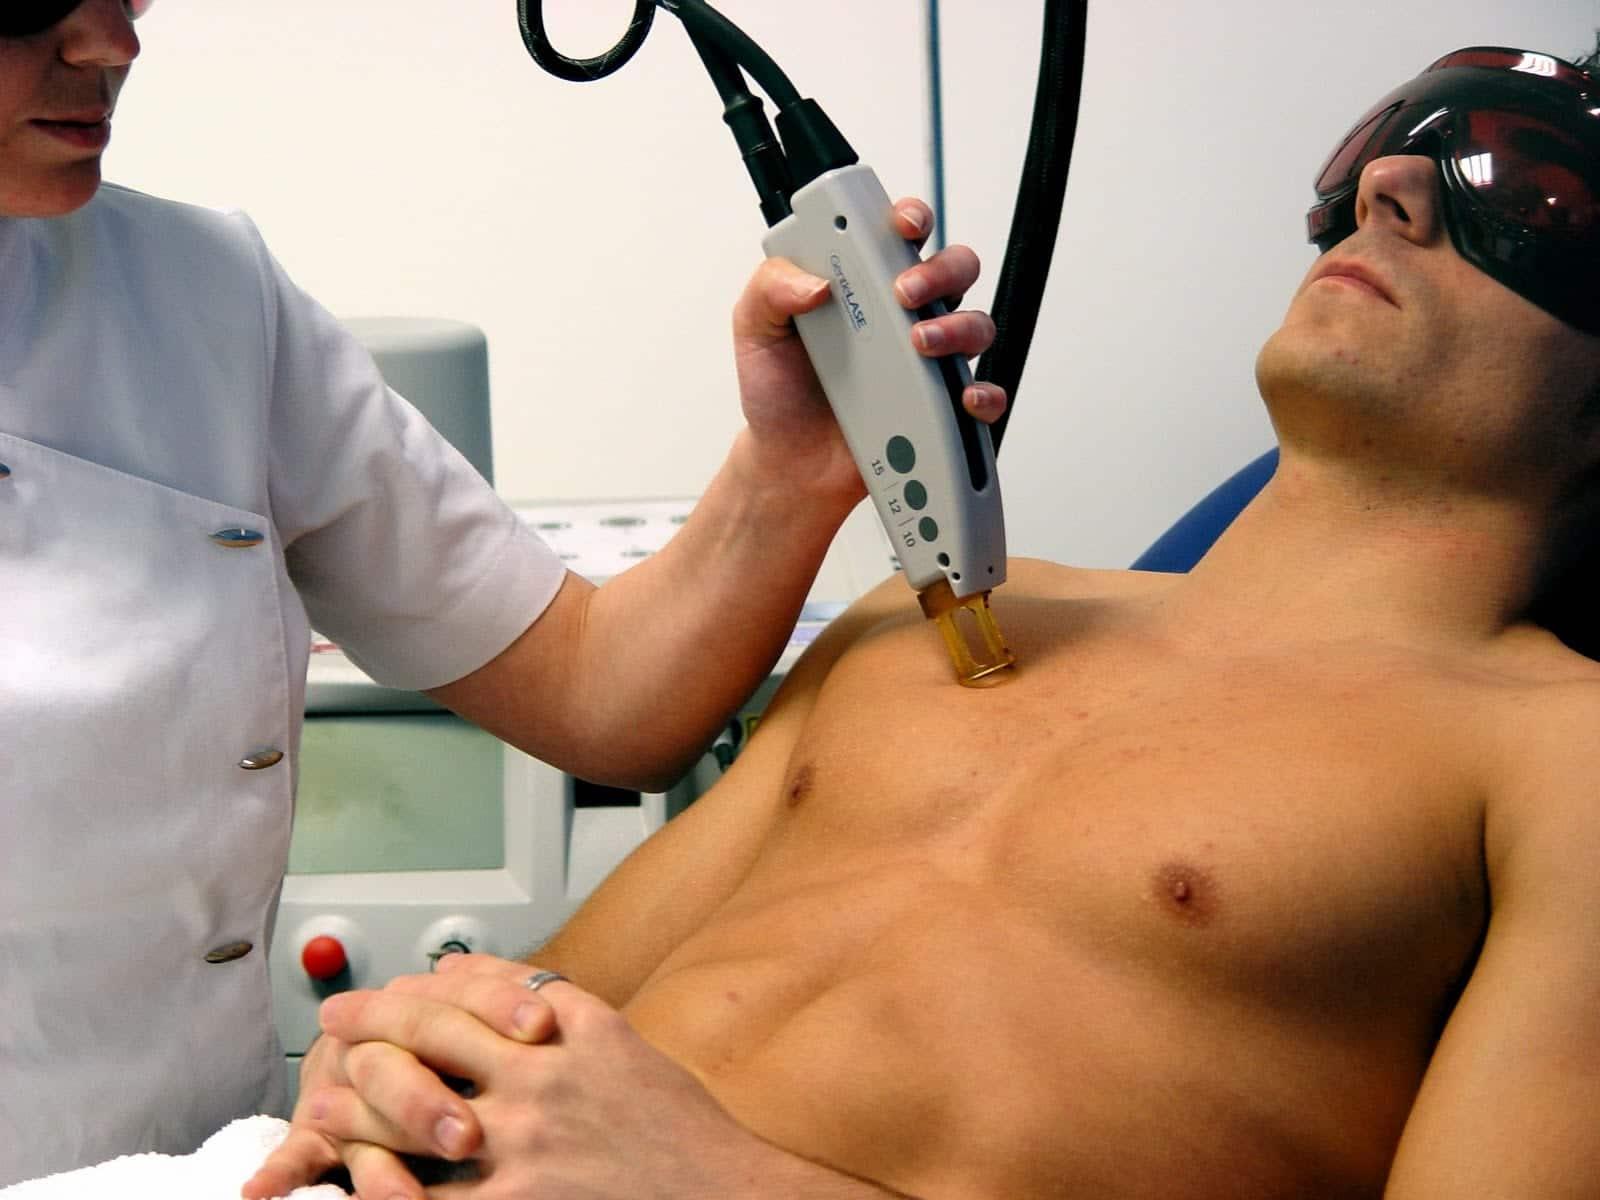 ¿Luz Pulsada o Láser para la depilación masculina?